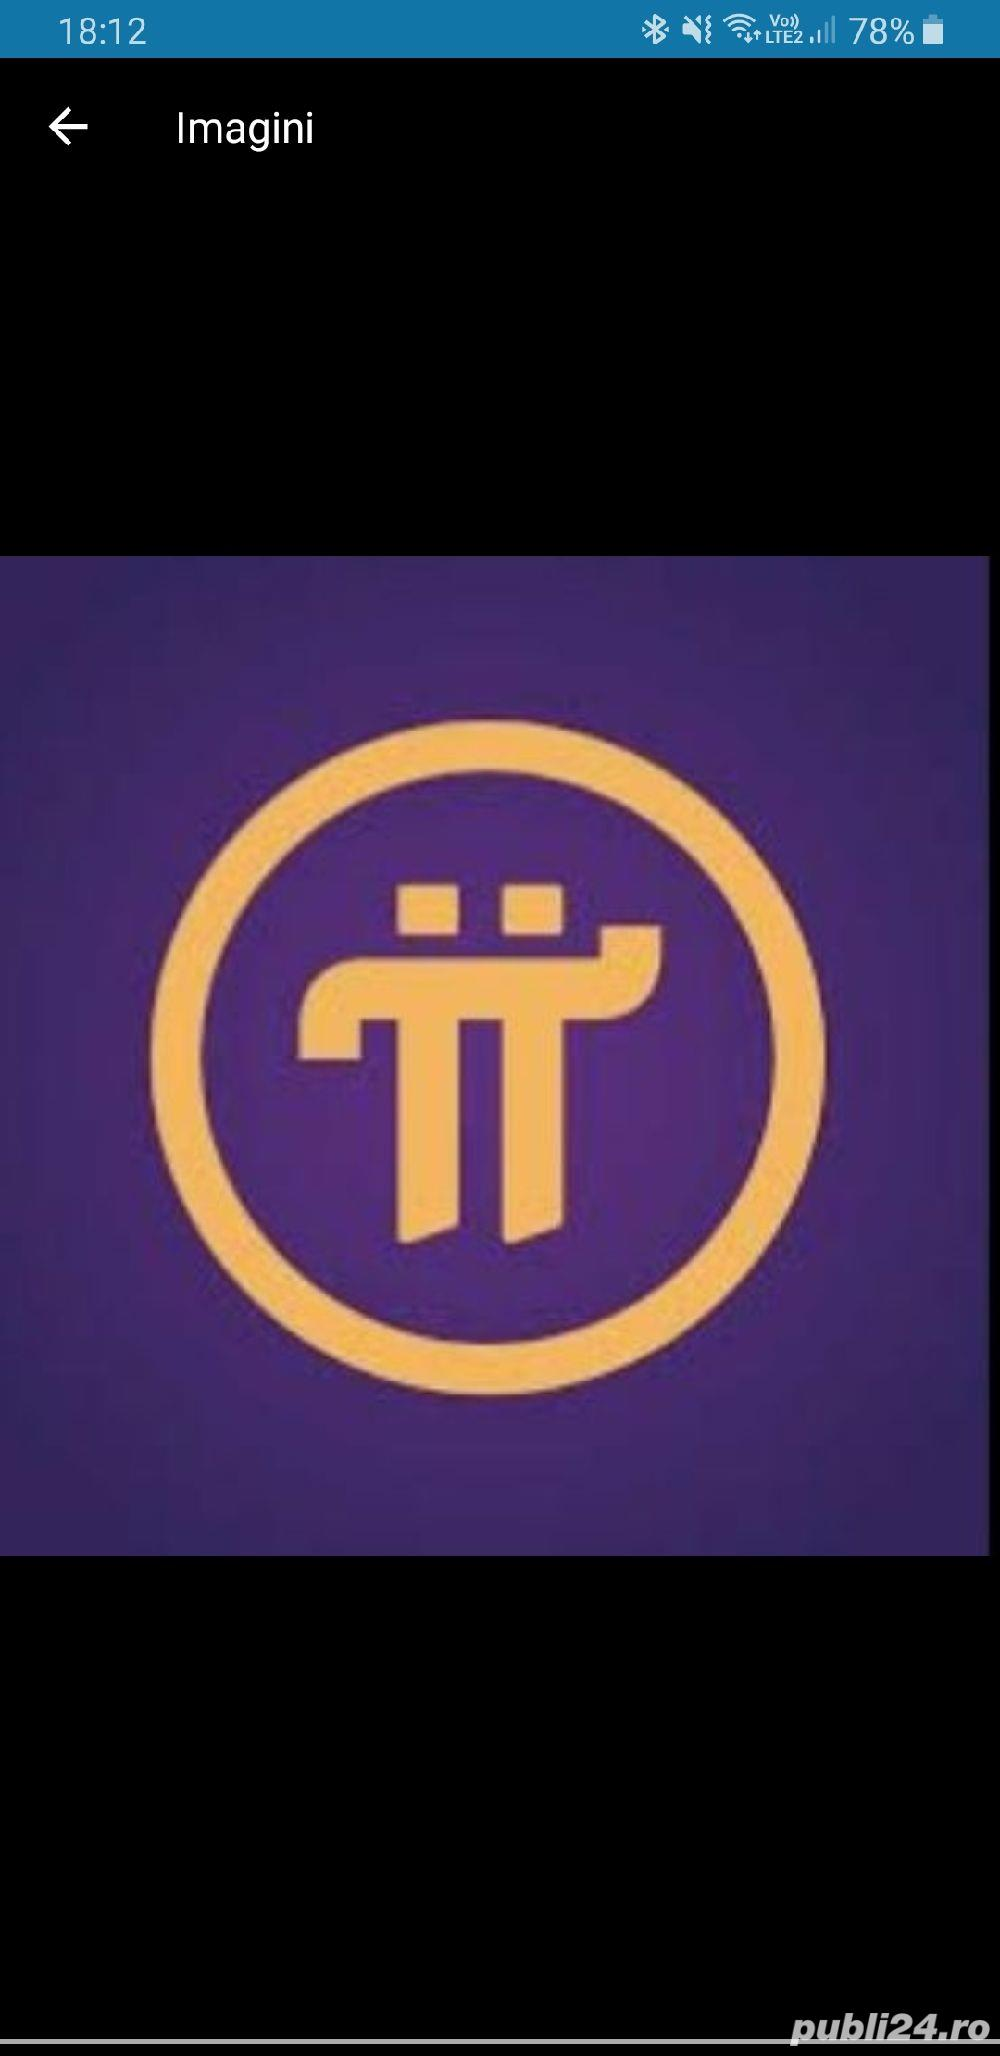 Pi network(minare) direct de pe telefon. Mining